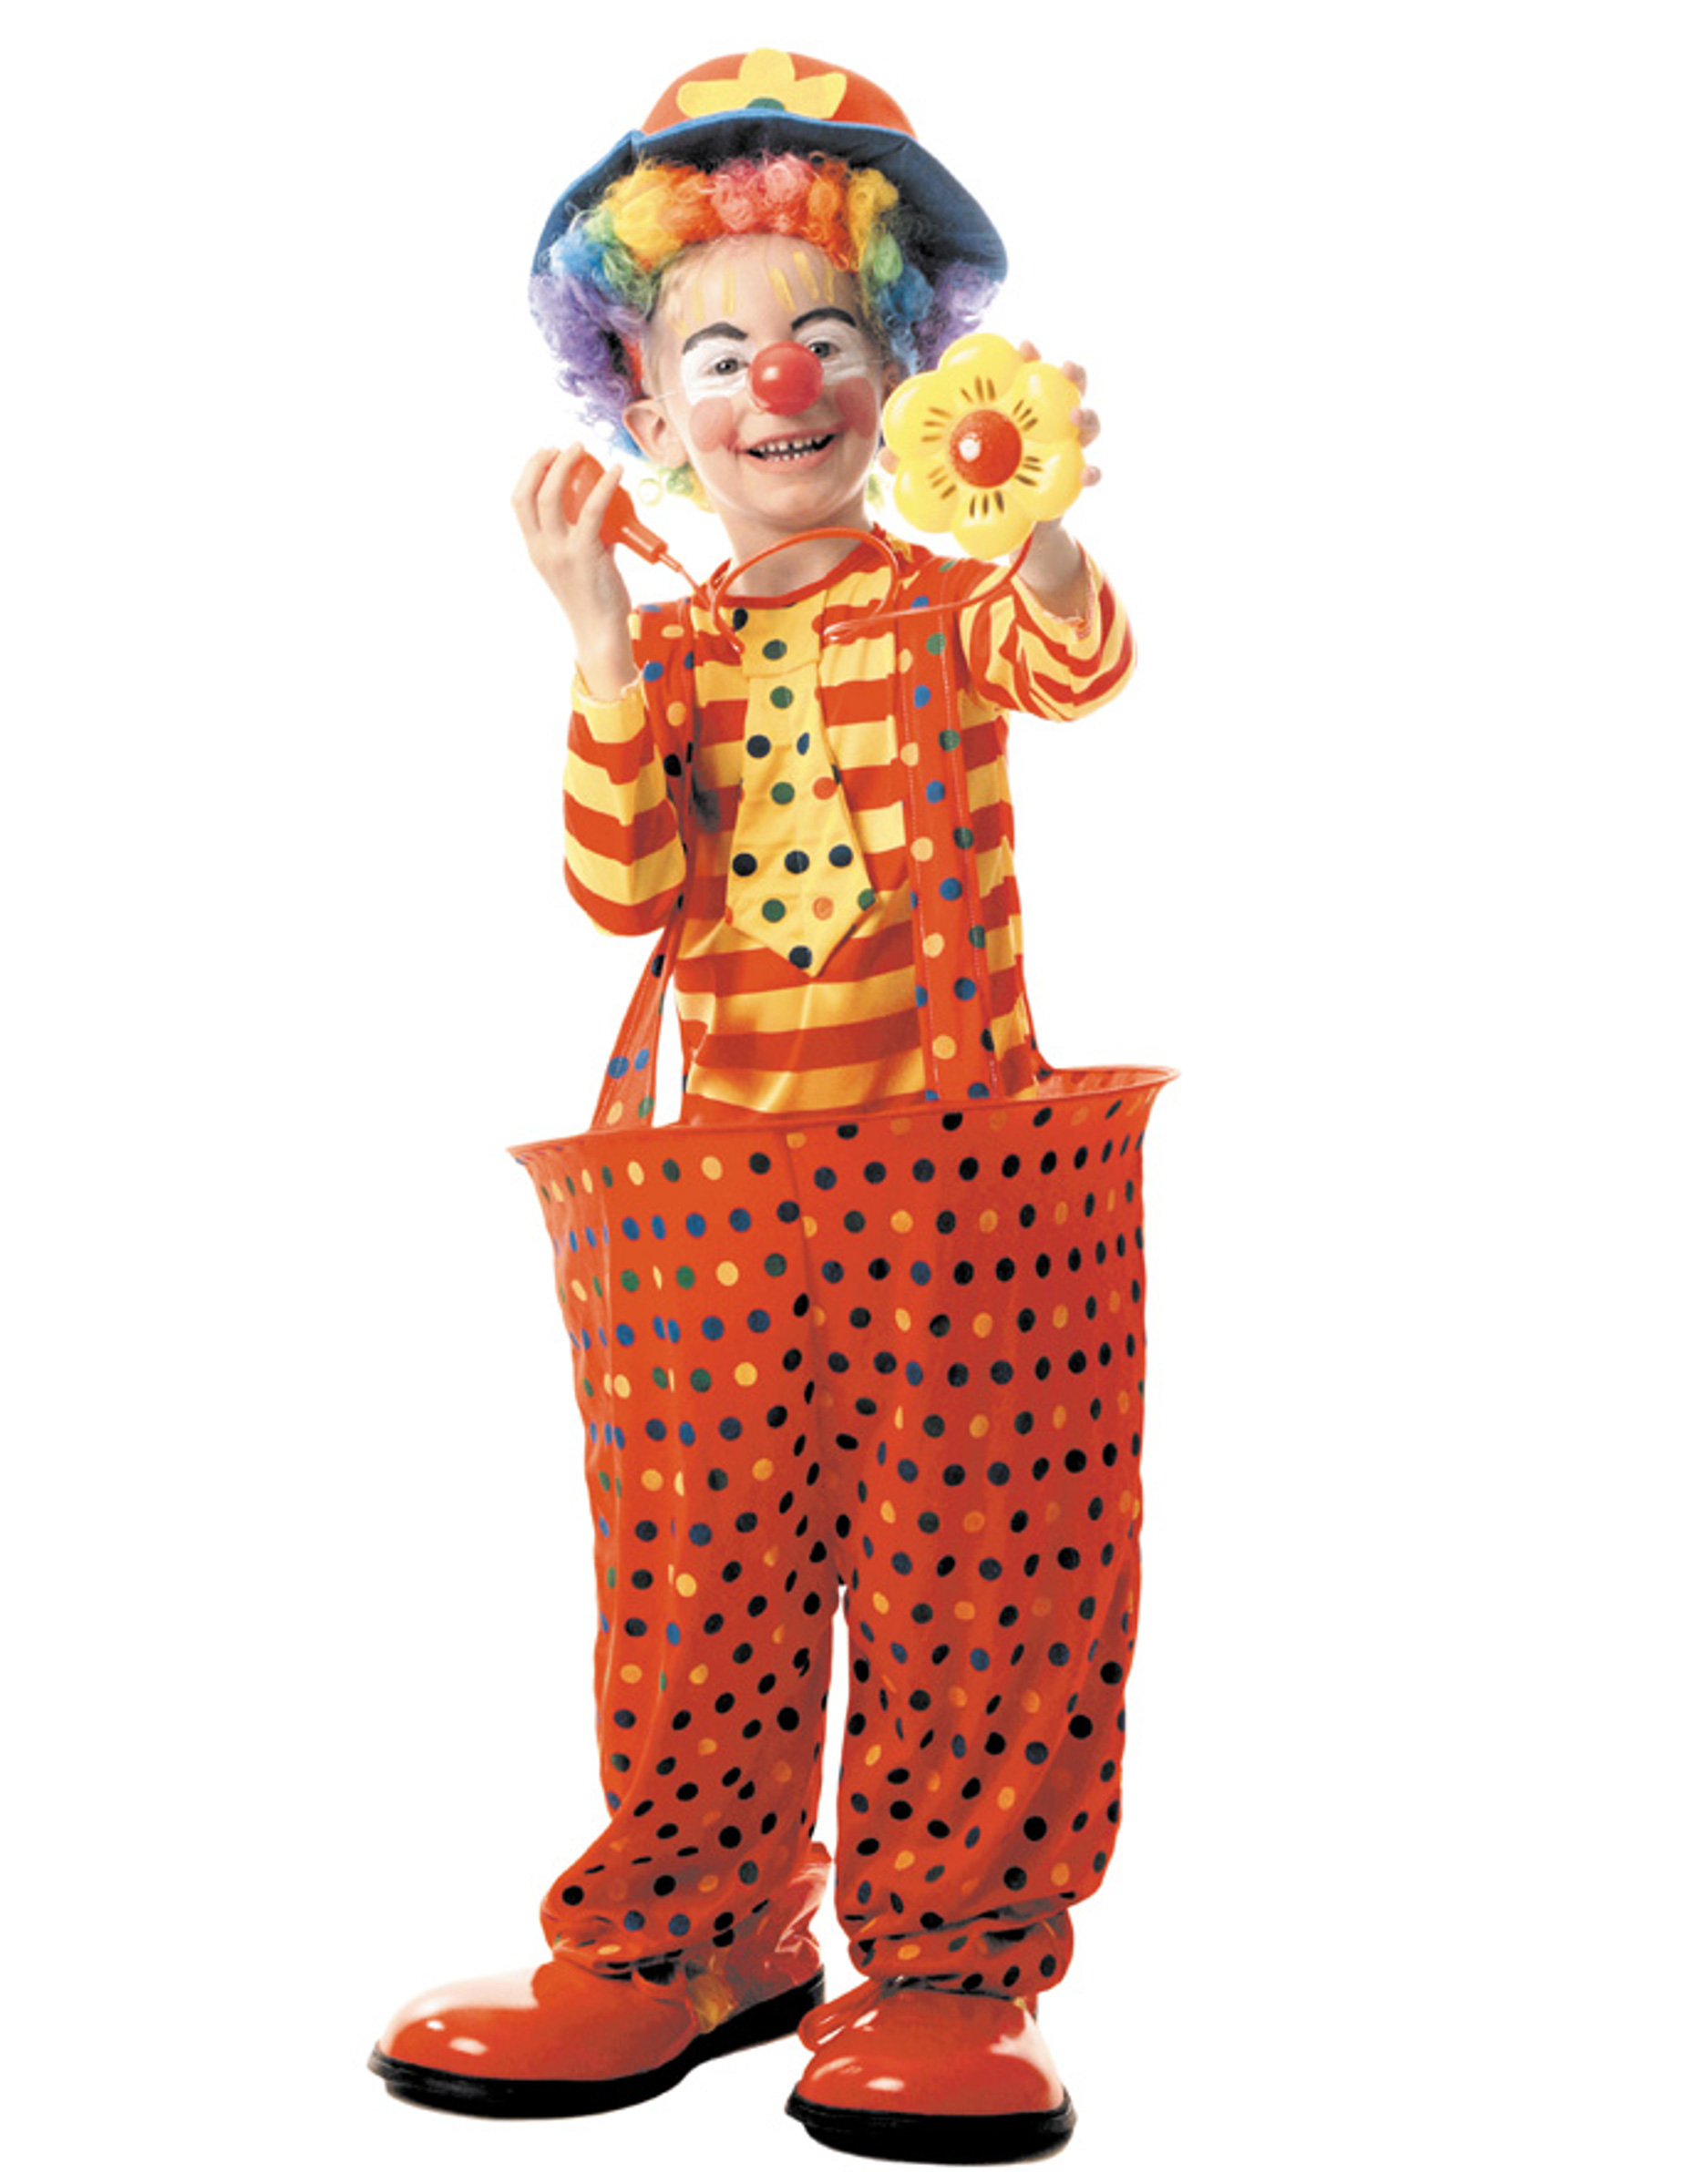 clown kost n mit reifen f r kinder kost me f r kinder und g nstige faschingskost me vegaoo. Black Bedroom Furniture Sets. Home Design Ideas